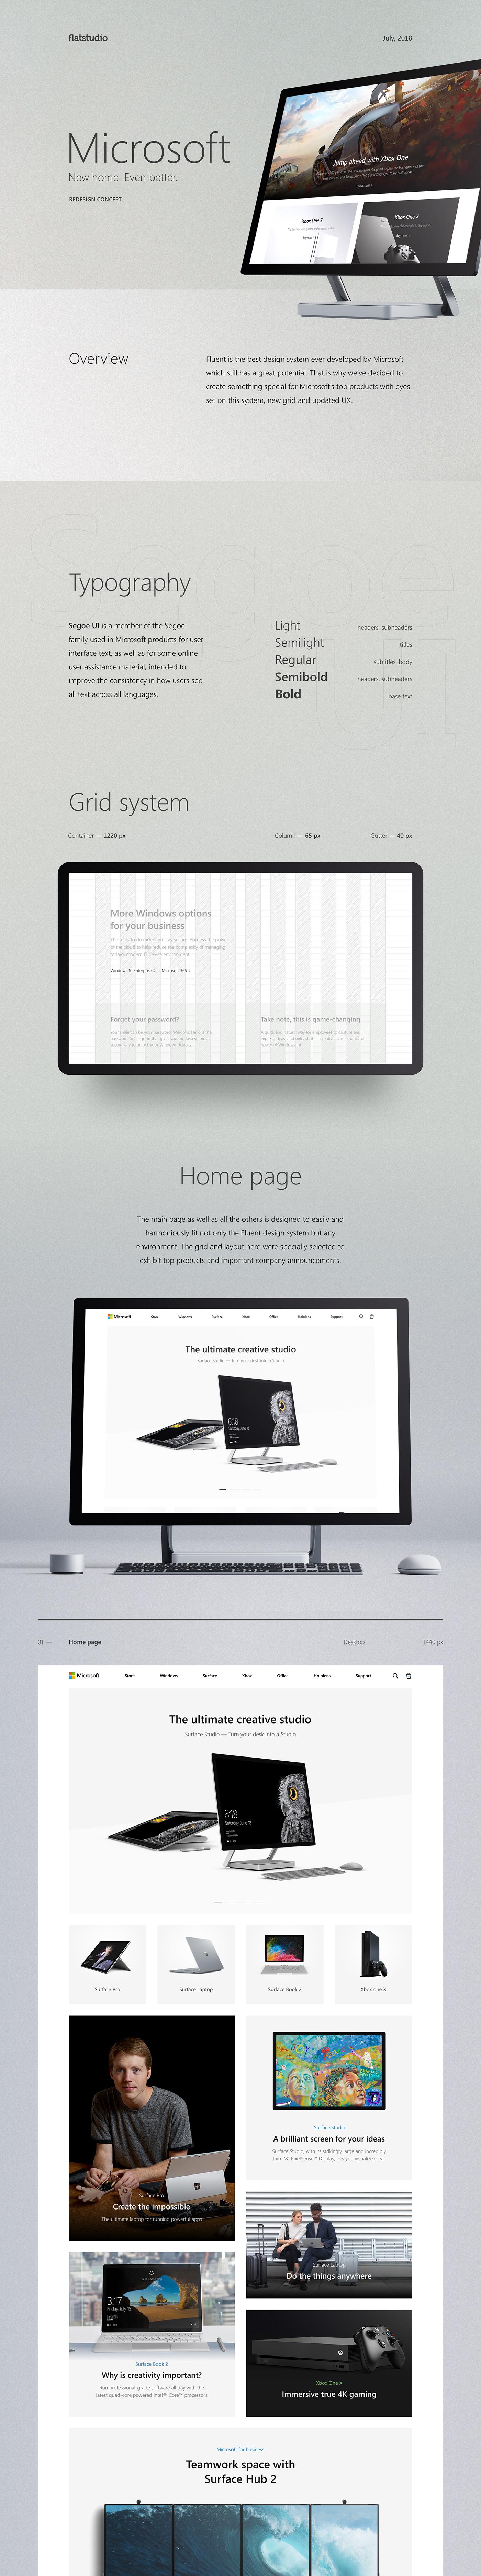 Microsoft redesign redesign concepts Responsive flatstudio flat landing Hololense windows Office365 xbox